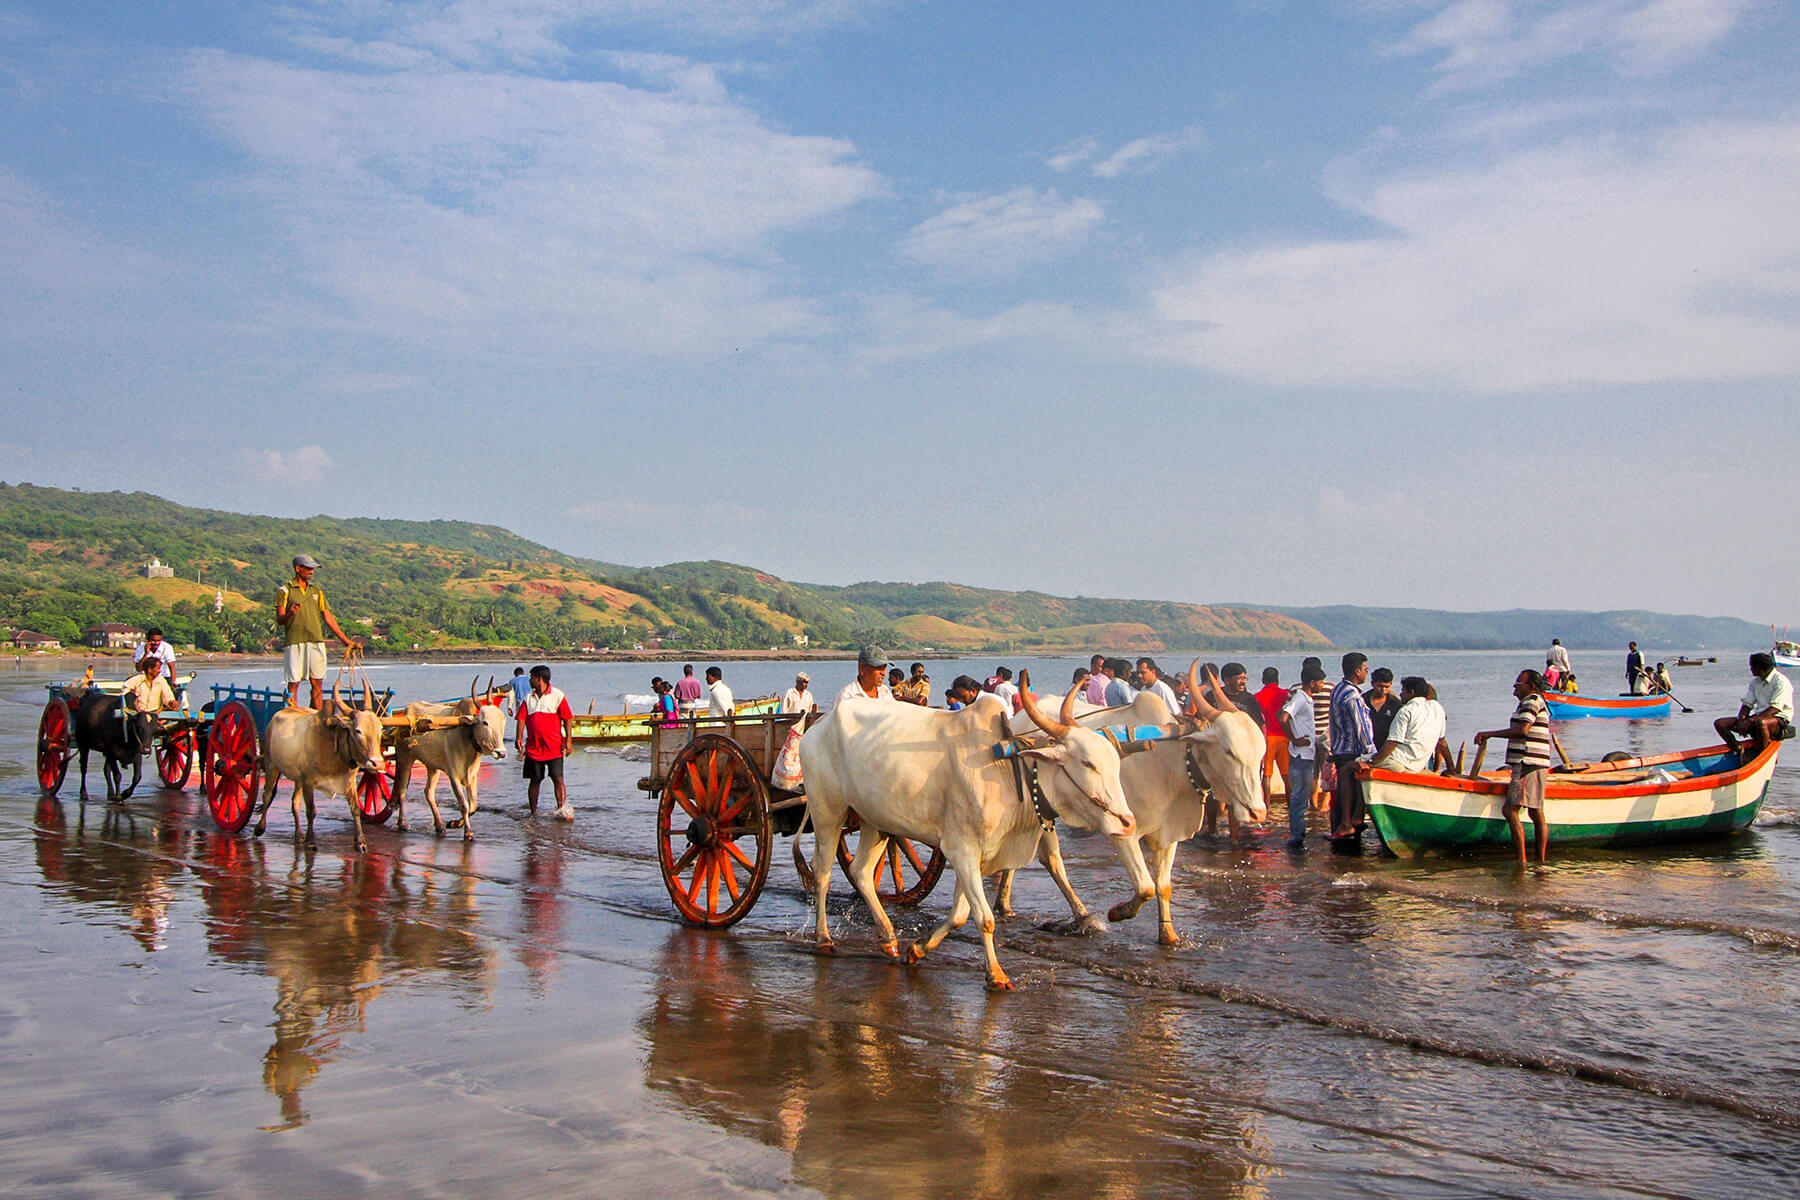 Image credit: Around Pune